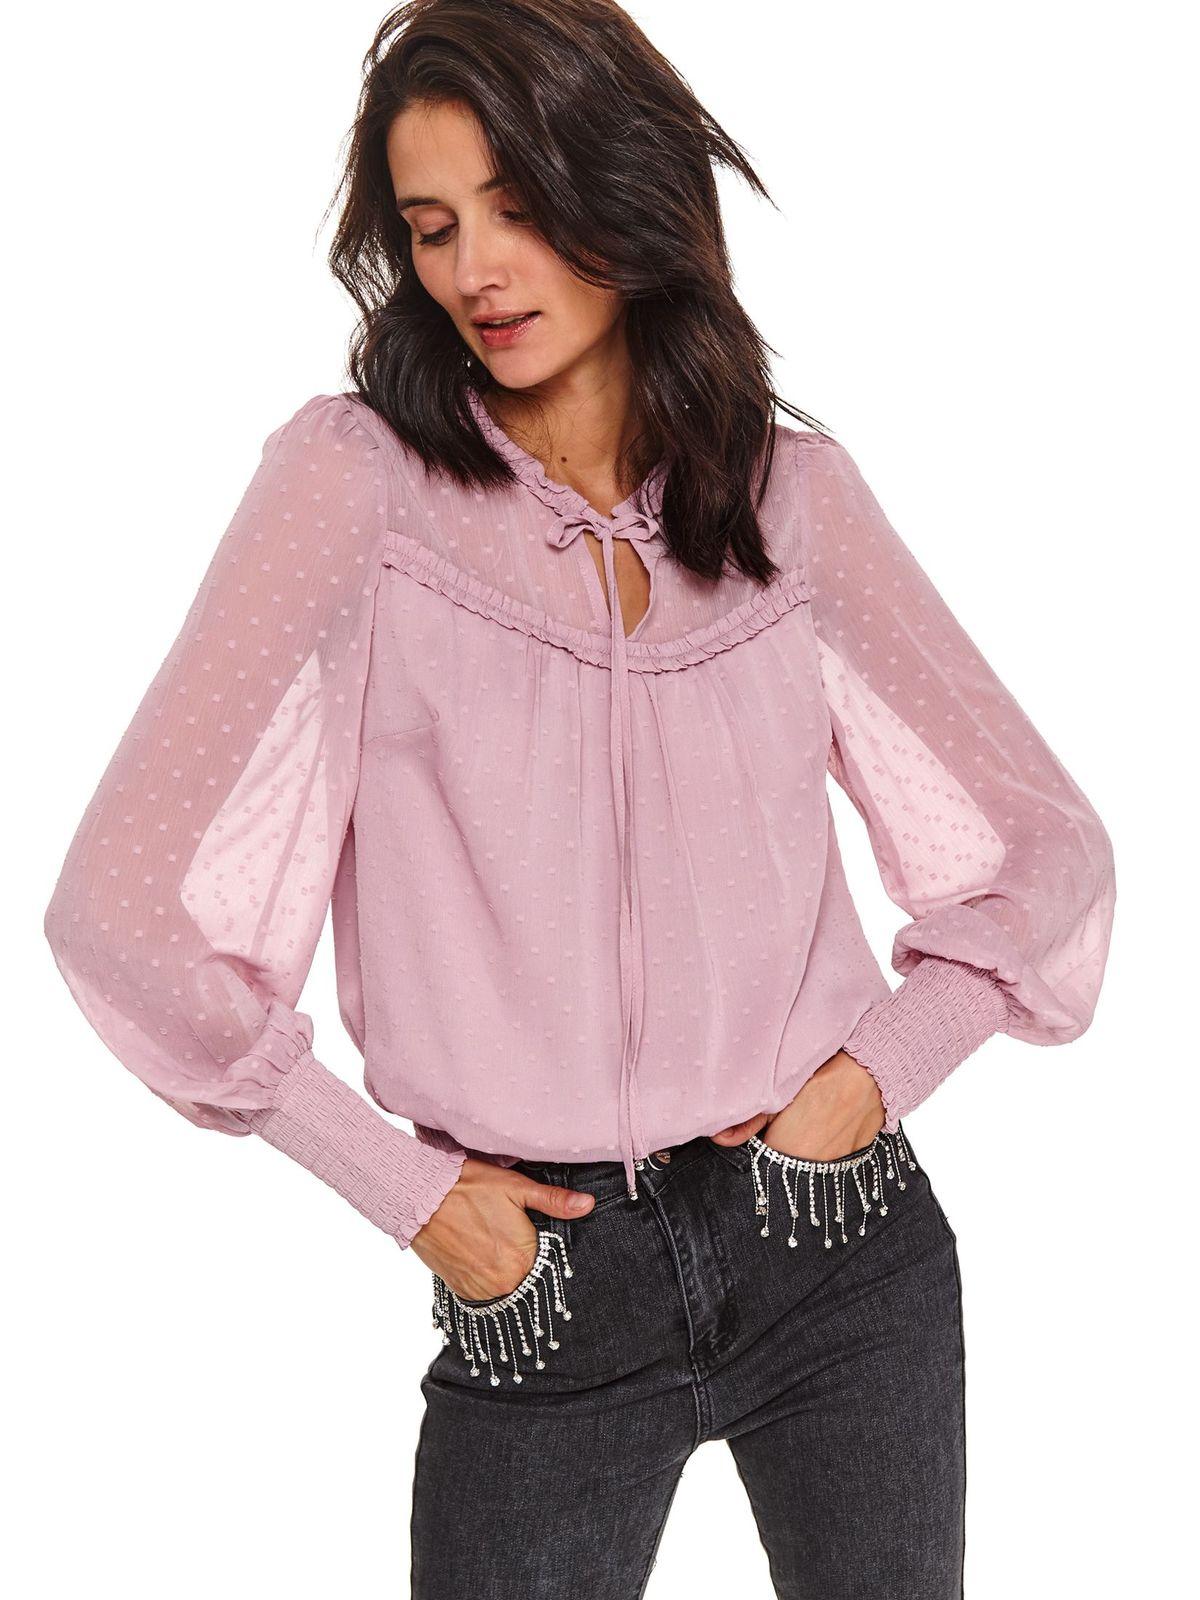 Bluza dama Top Secret roz deschis cu croi larg din voal cu maneci transparente